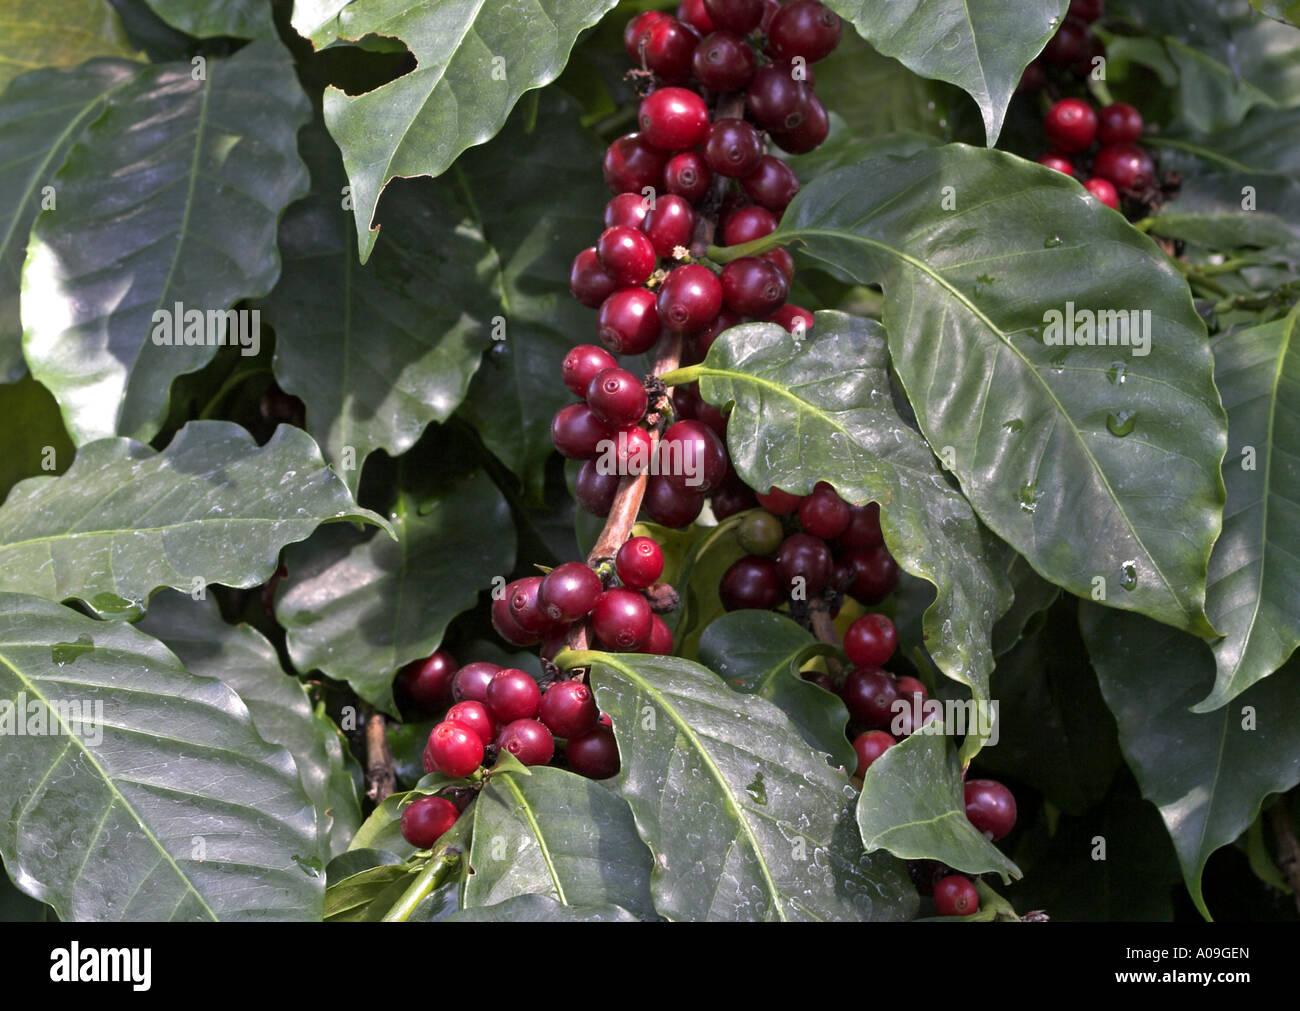 Arabian coffee coffea arabica fruits stock photo for Coffea arabica